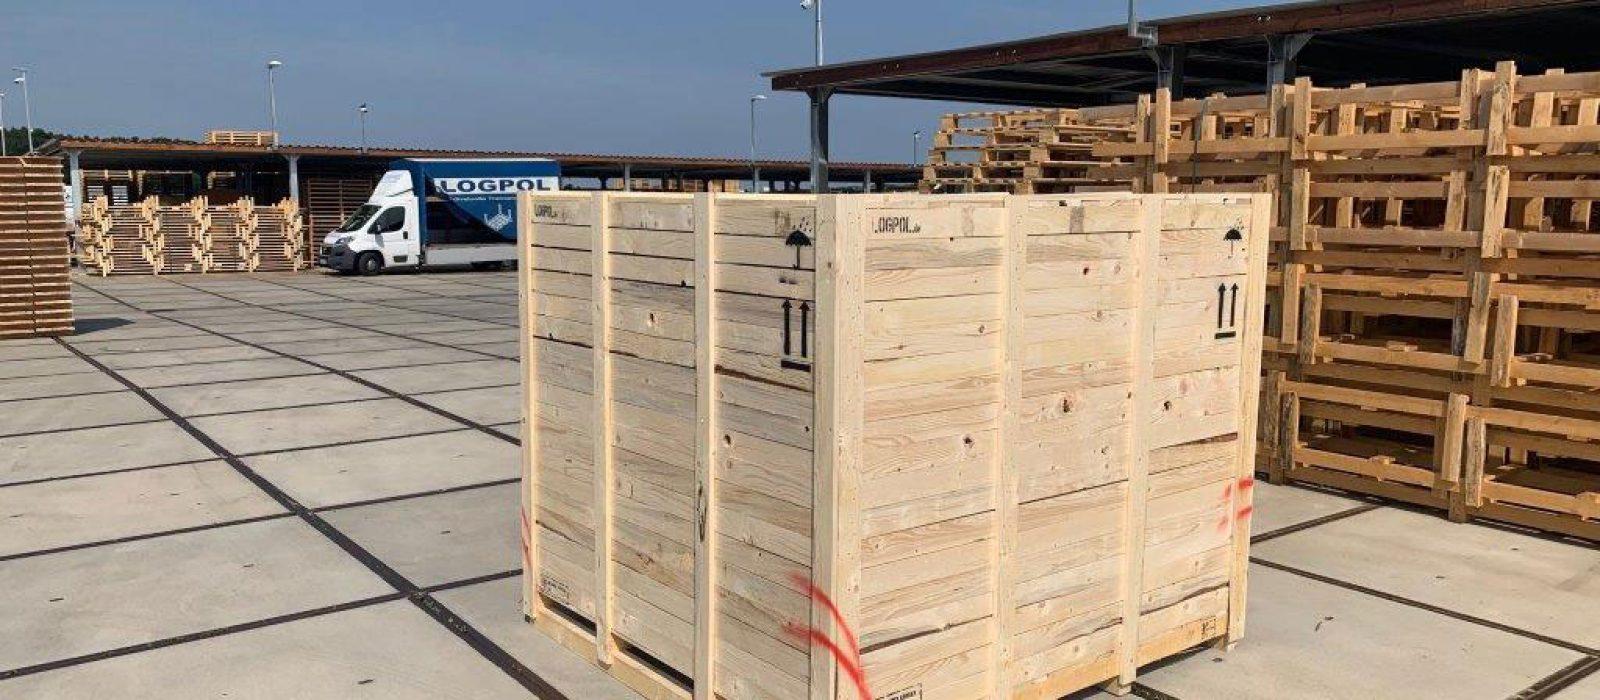 Holzkiste-2200x2350x1750-mm-LOGPOL